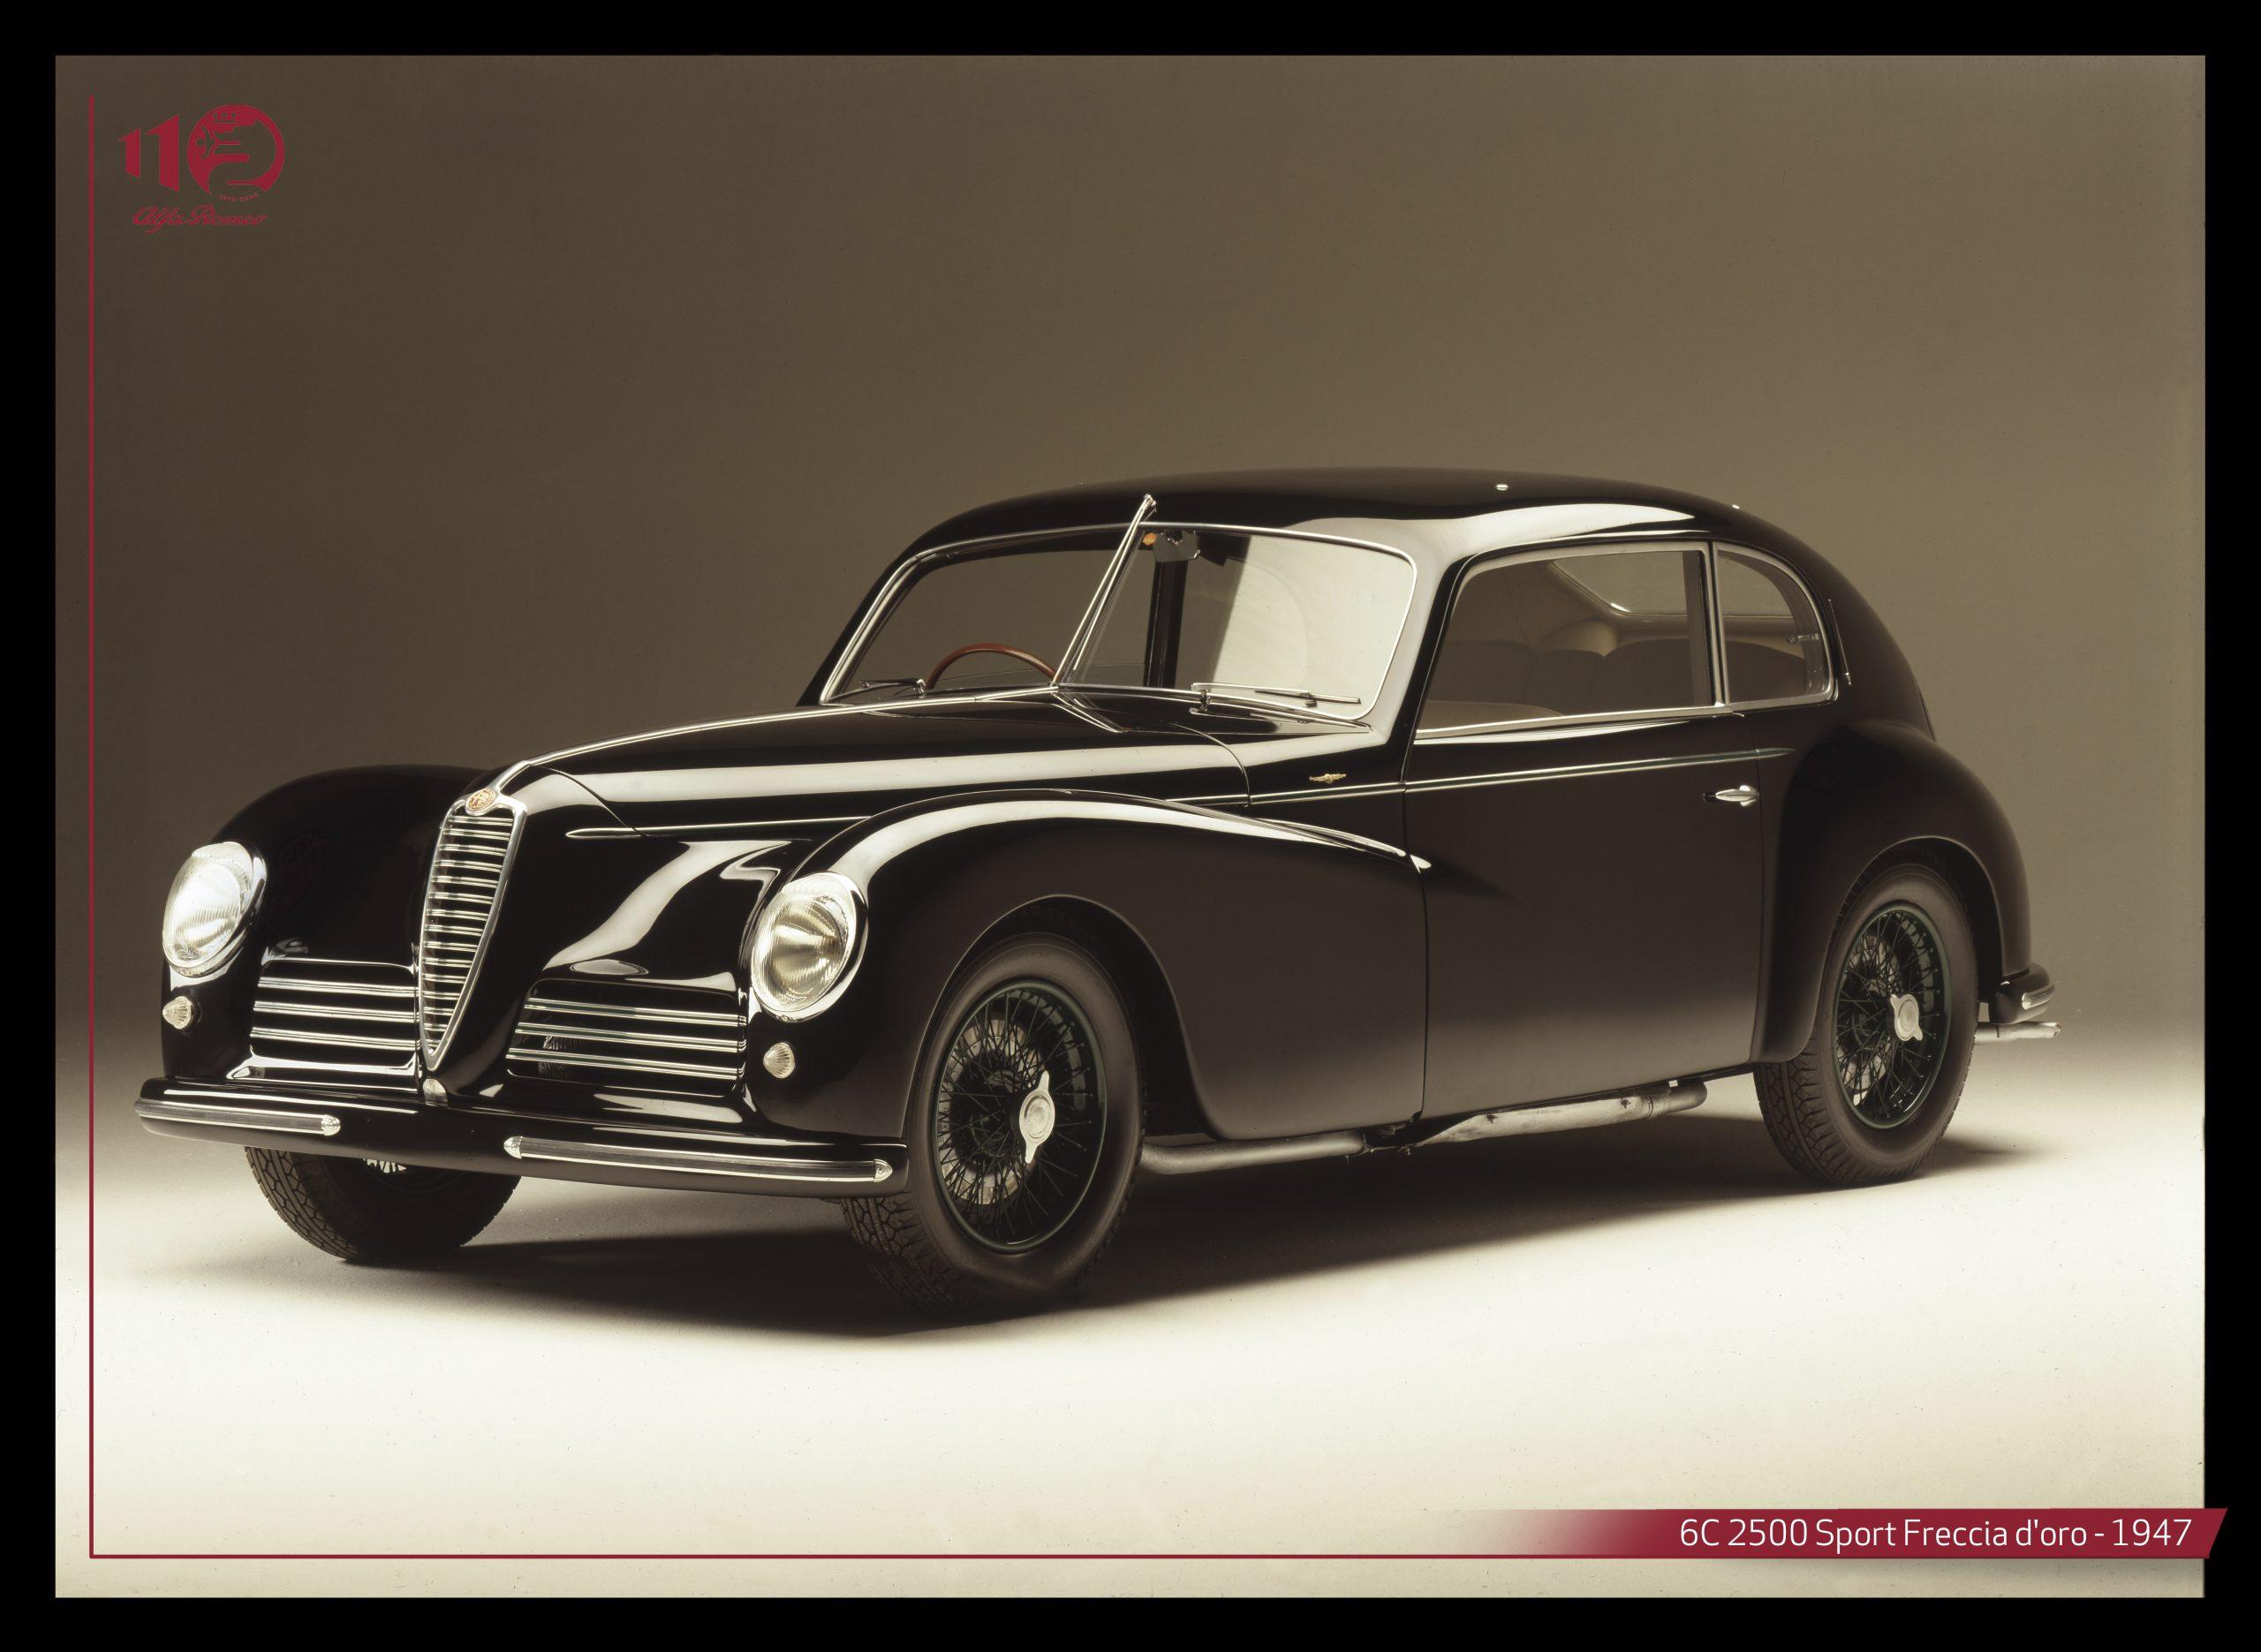 Alfa Romeo 6c 2500 sport freccia d'oro 1947